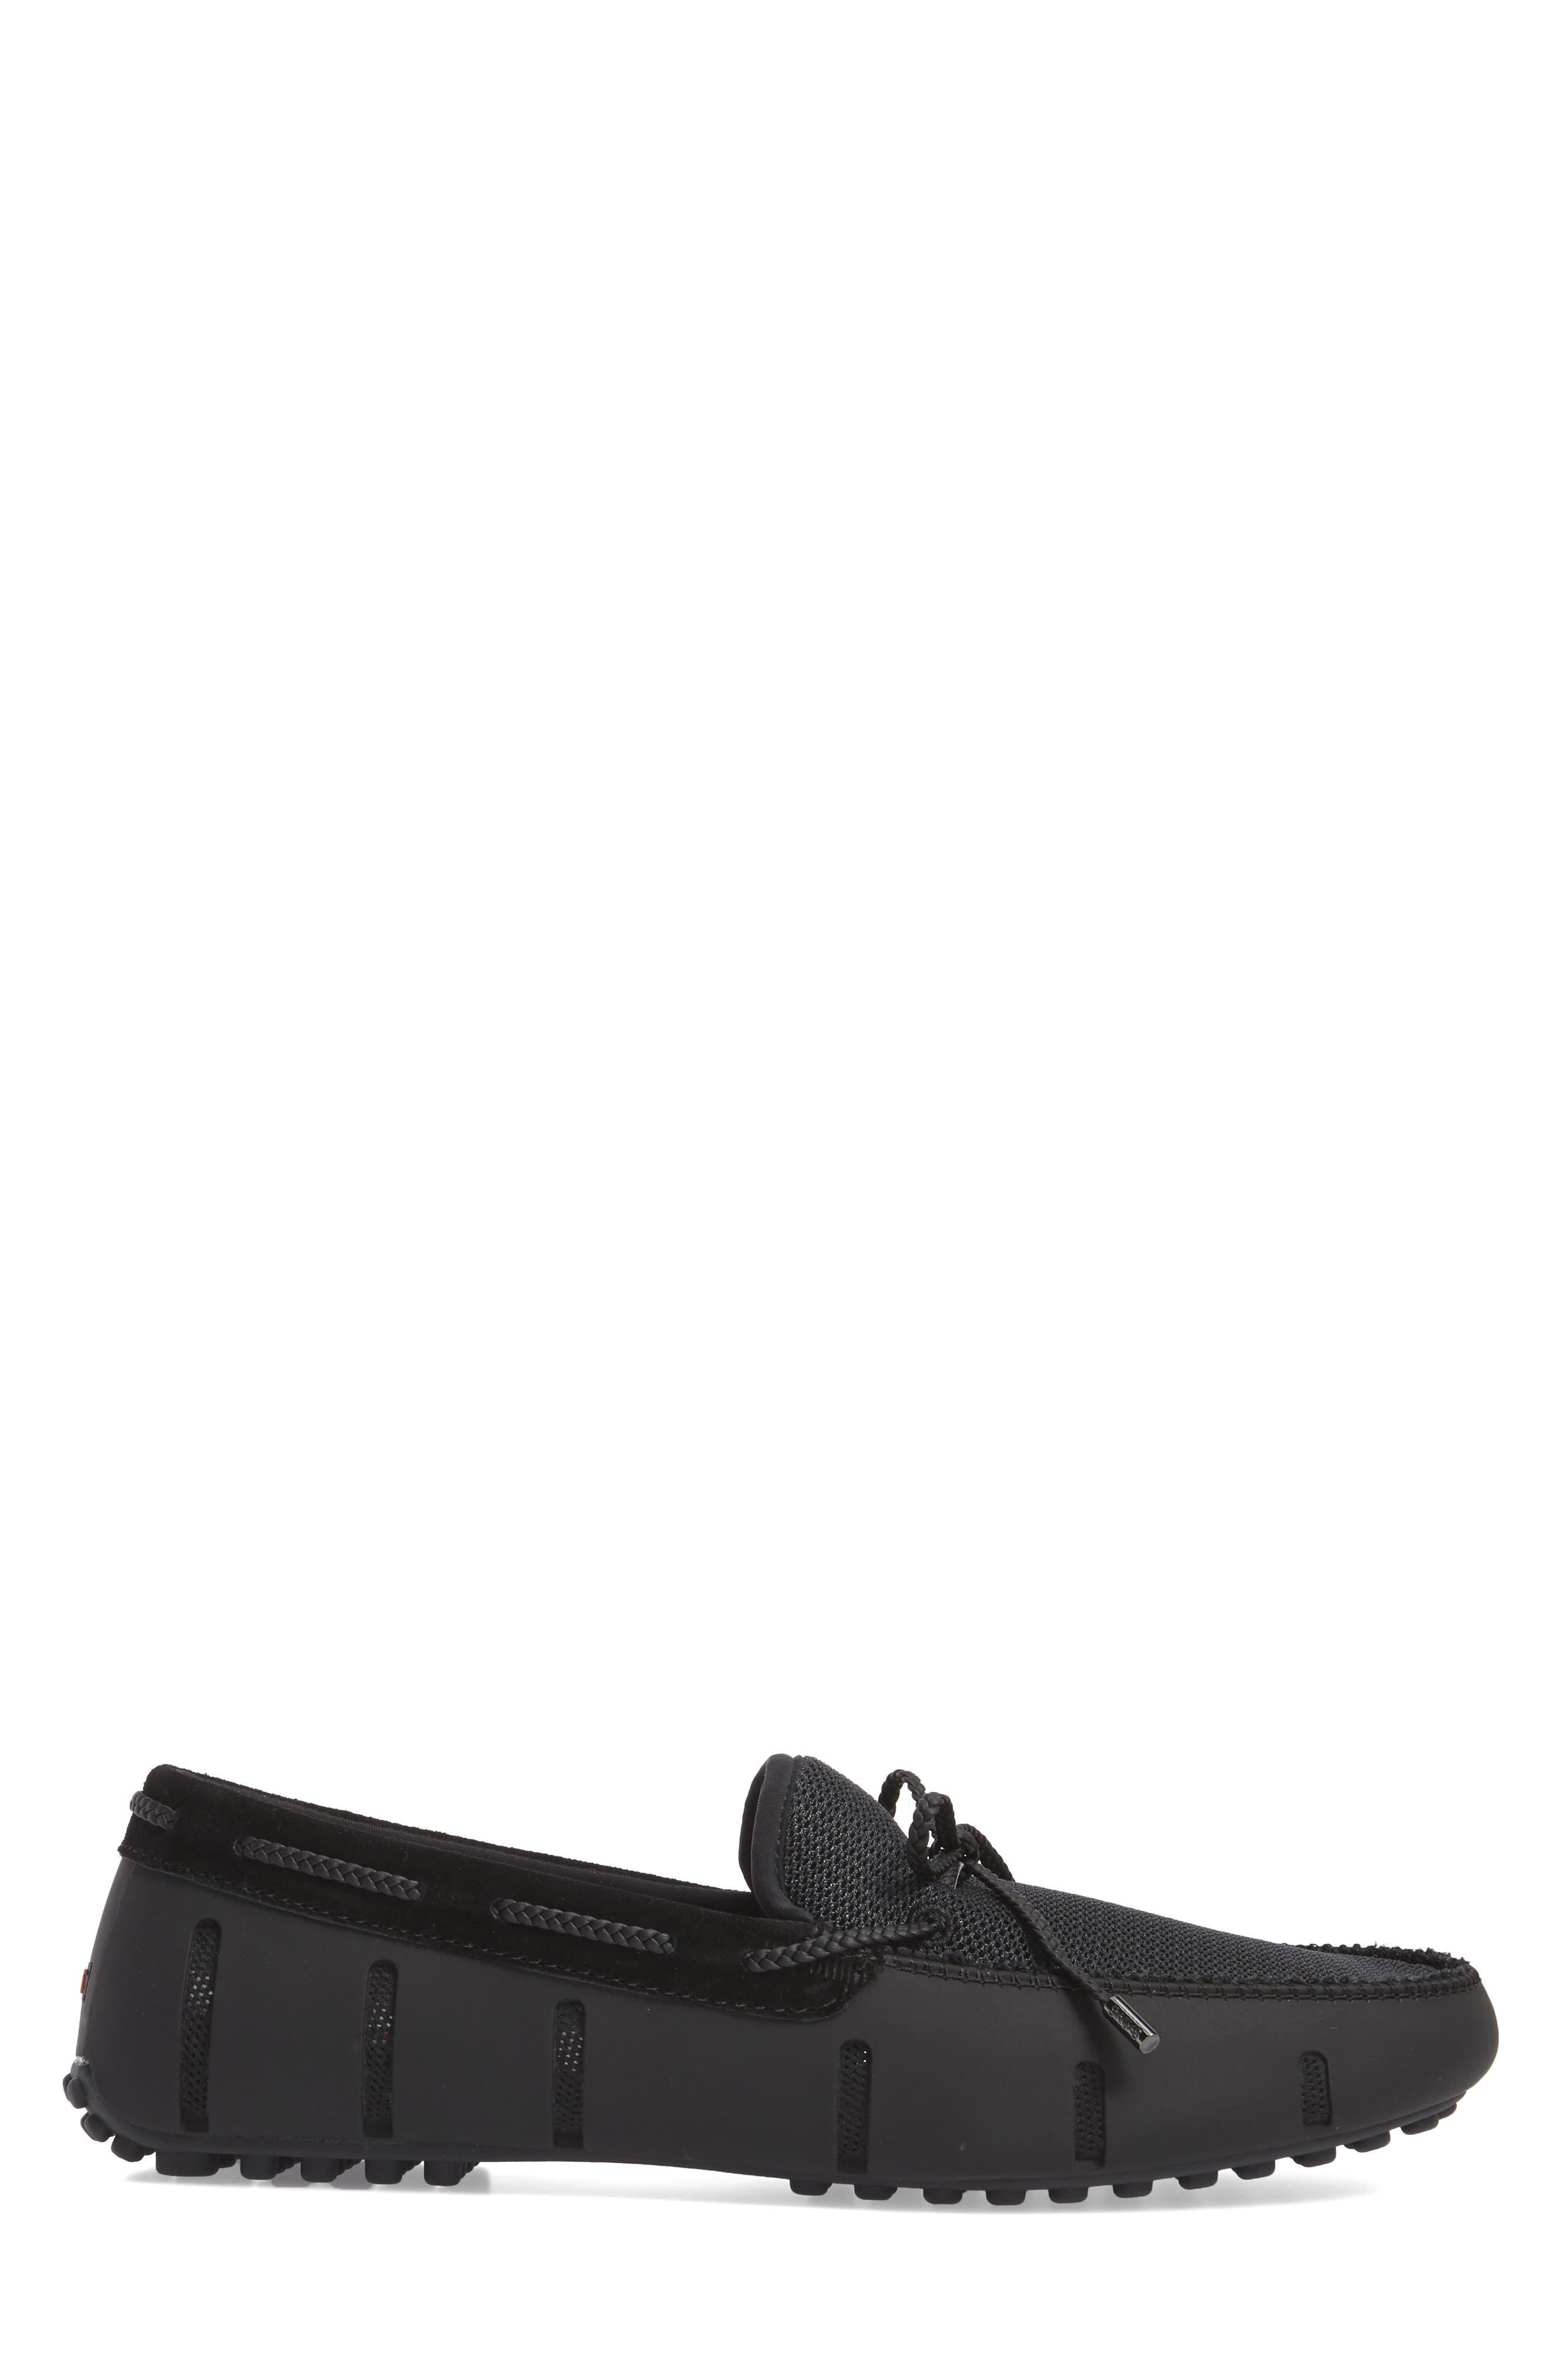 Driving Shoe,                             Alternate thumbnail 3, color,                             Black/ Graphite